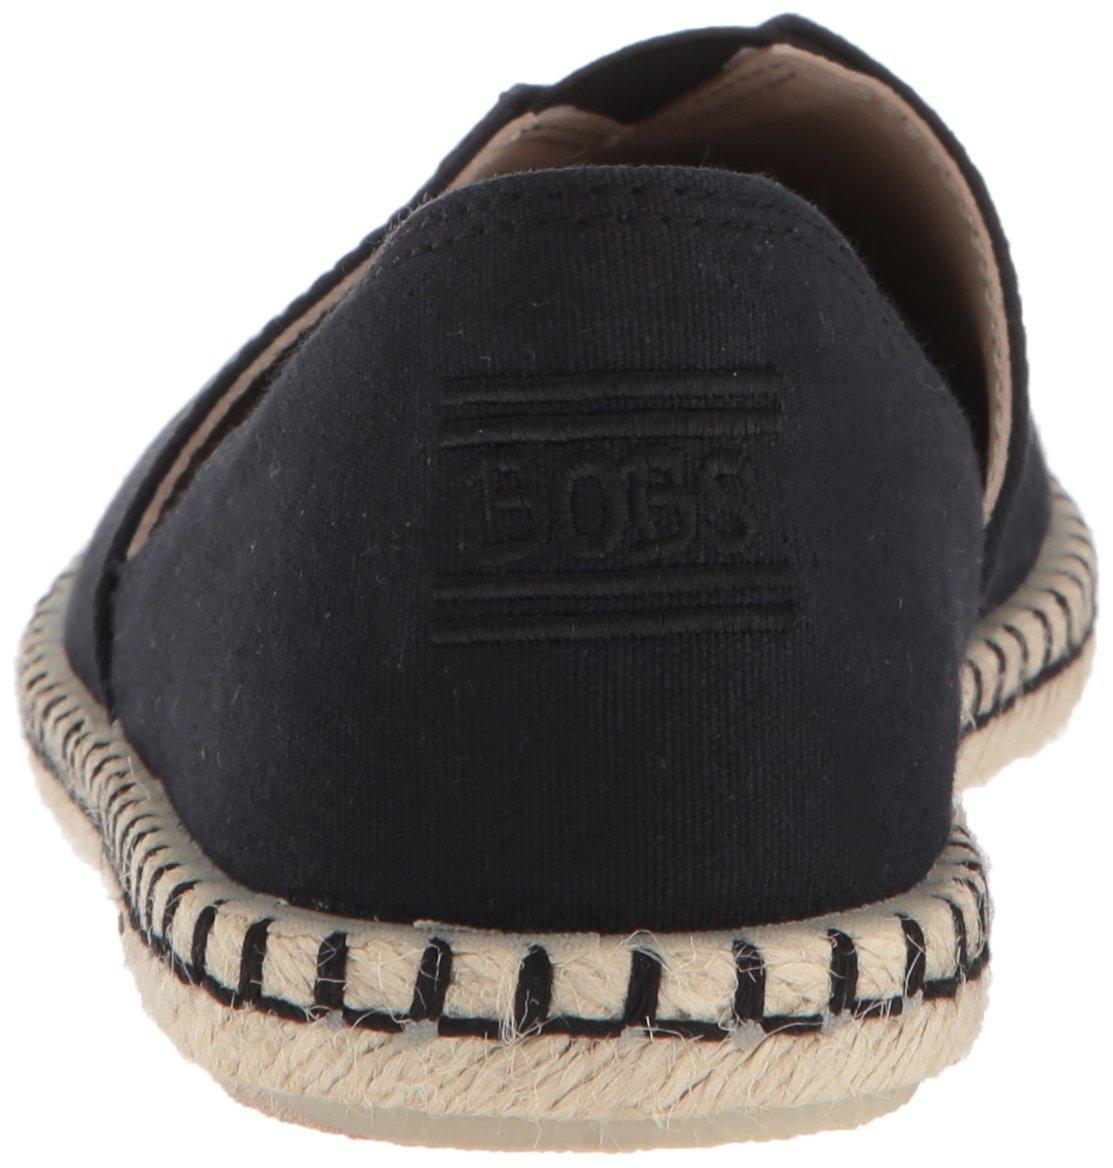 Skechers BOBS from Women's Bobs Day 2 Nite-Canvas Ballet Flat B074T4VPQR 9.5 B(M) US|Black/Black